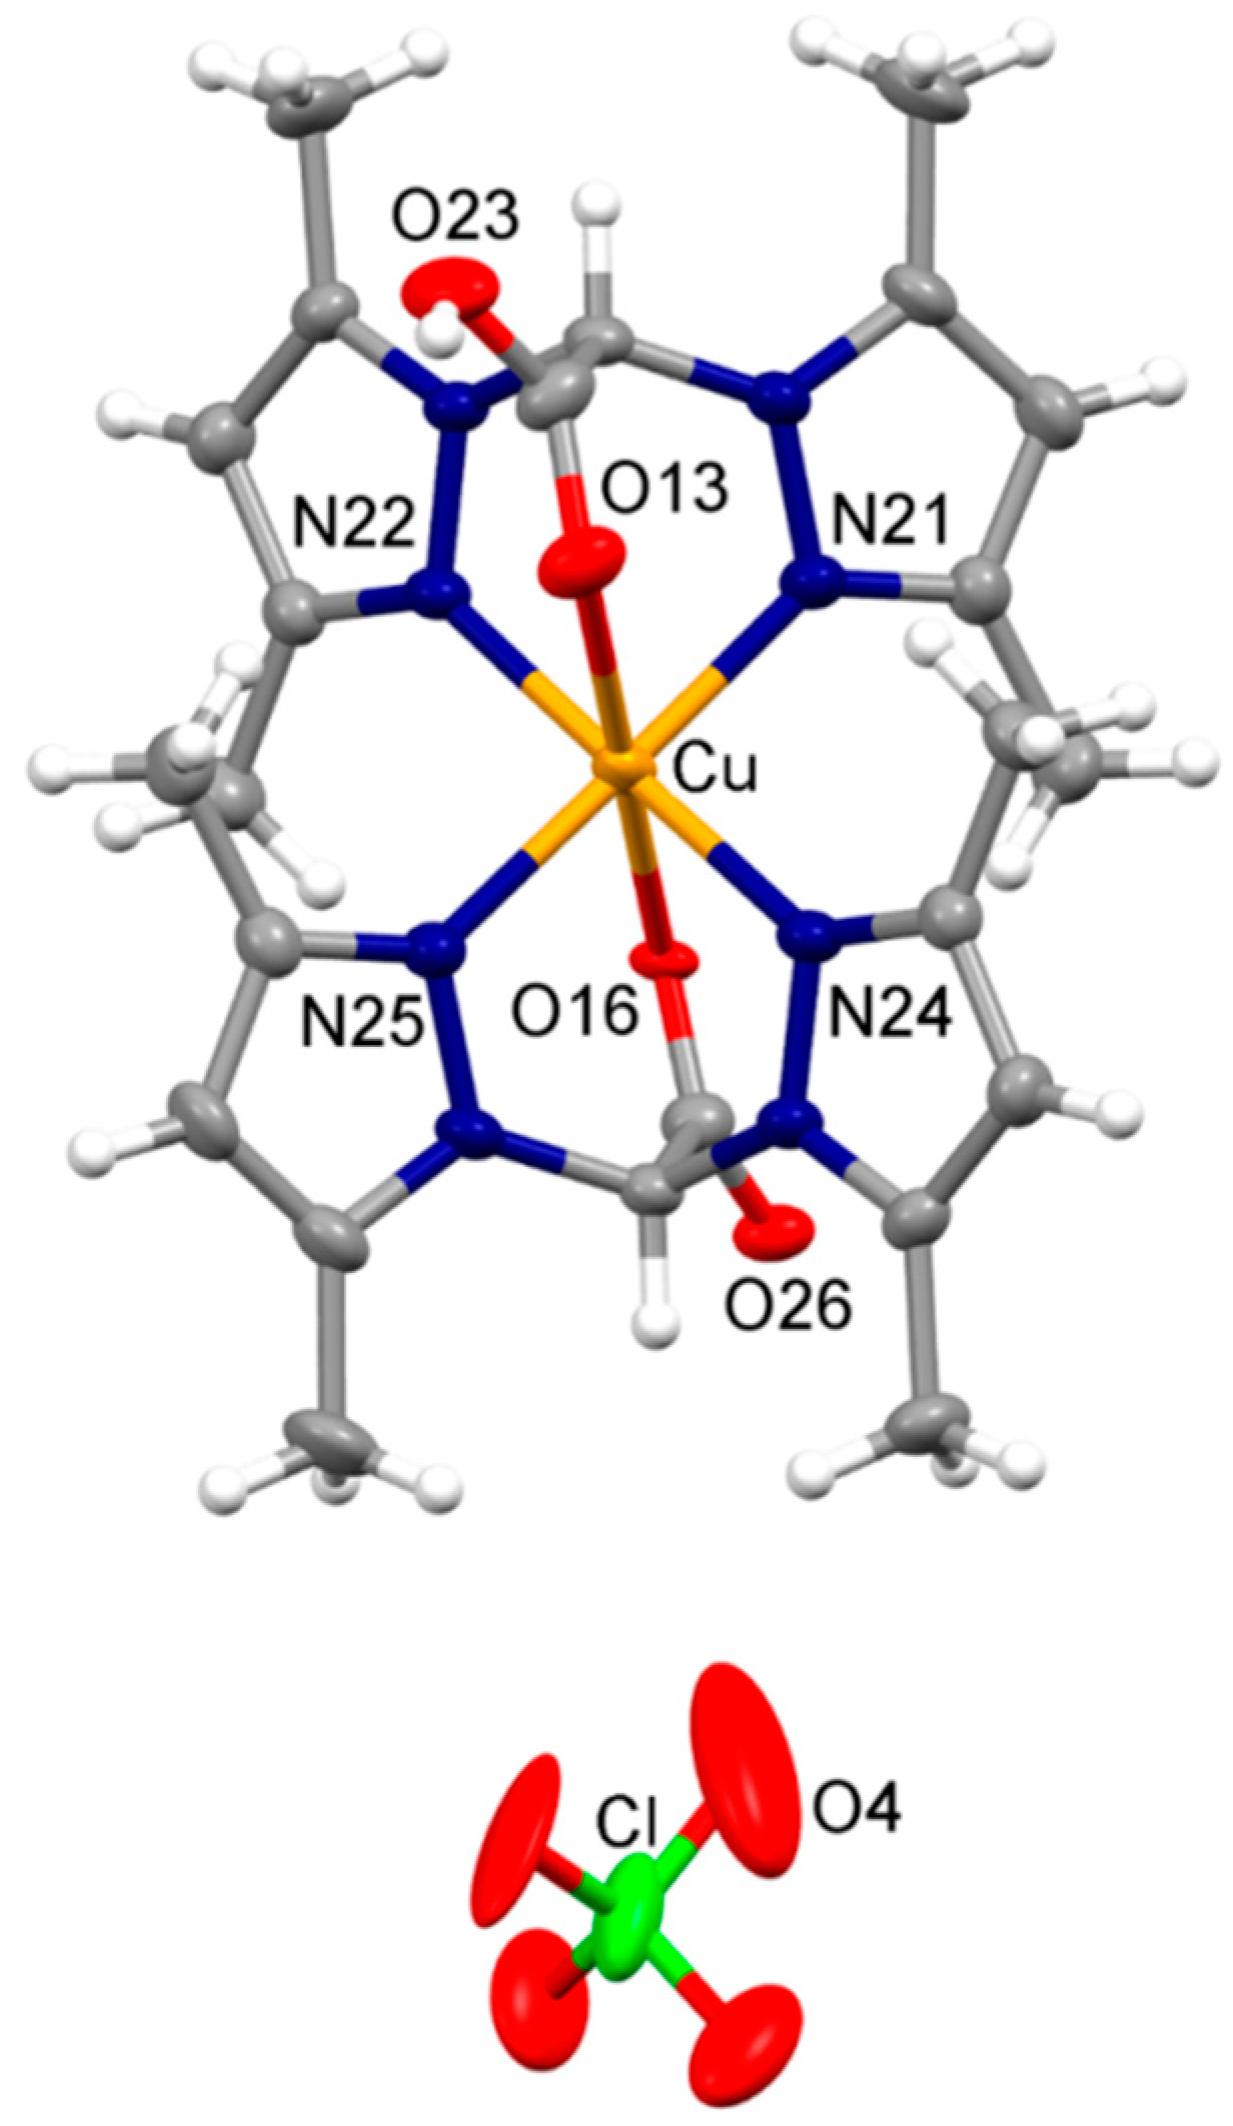 molecules 24 01761 g003